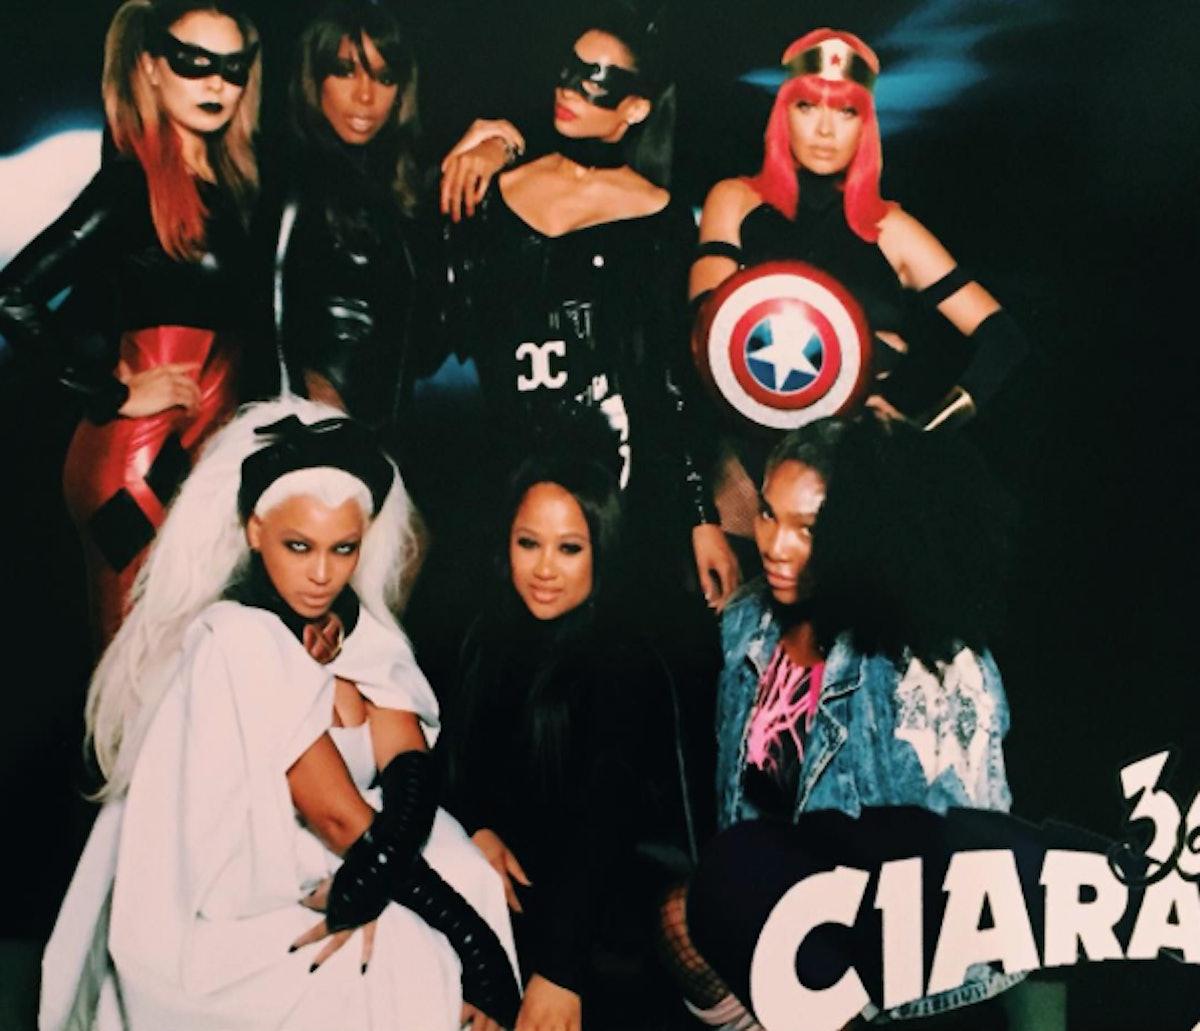 ciara birthday